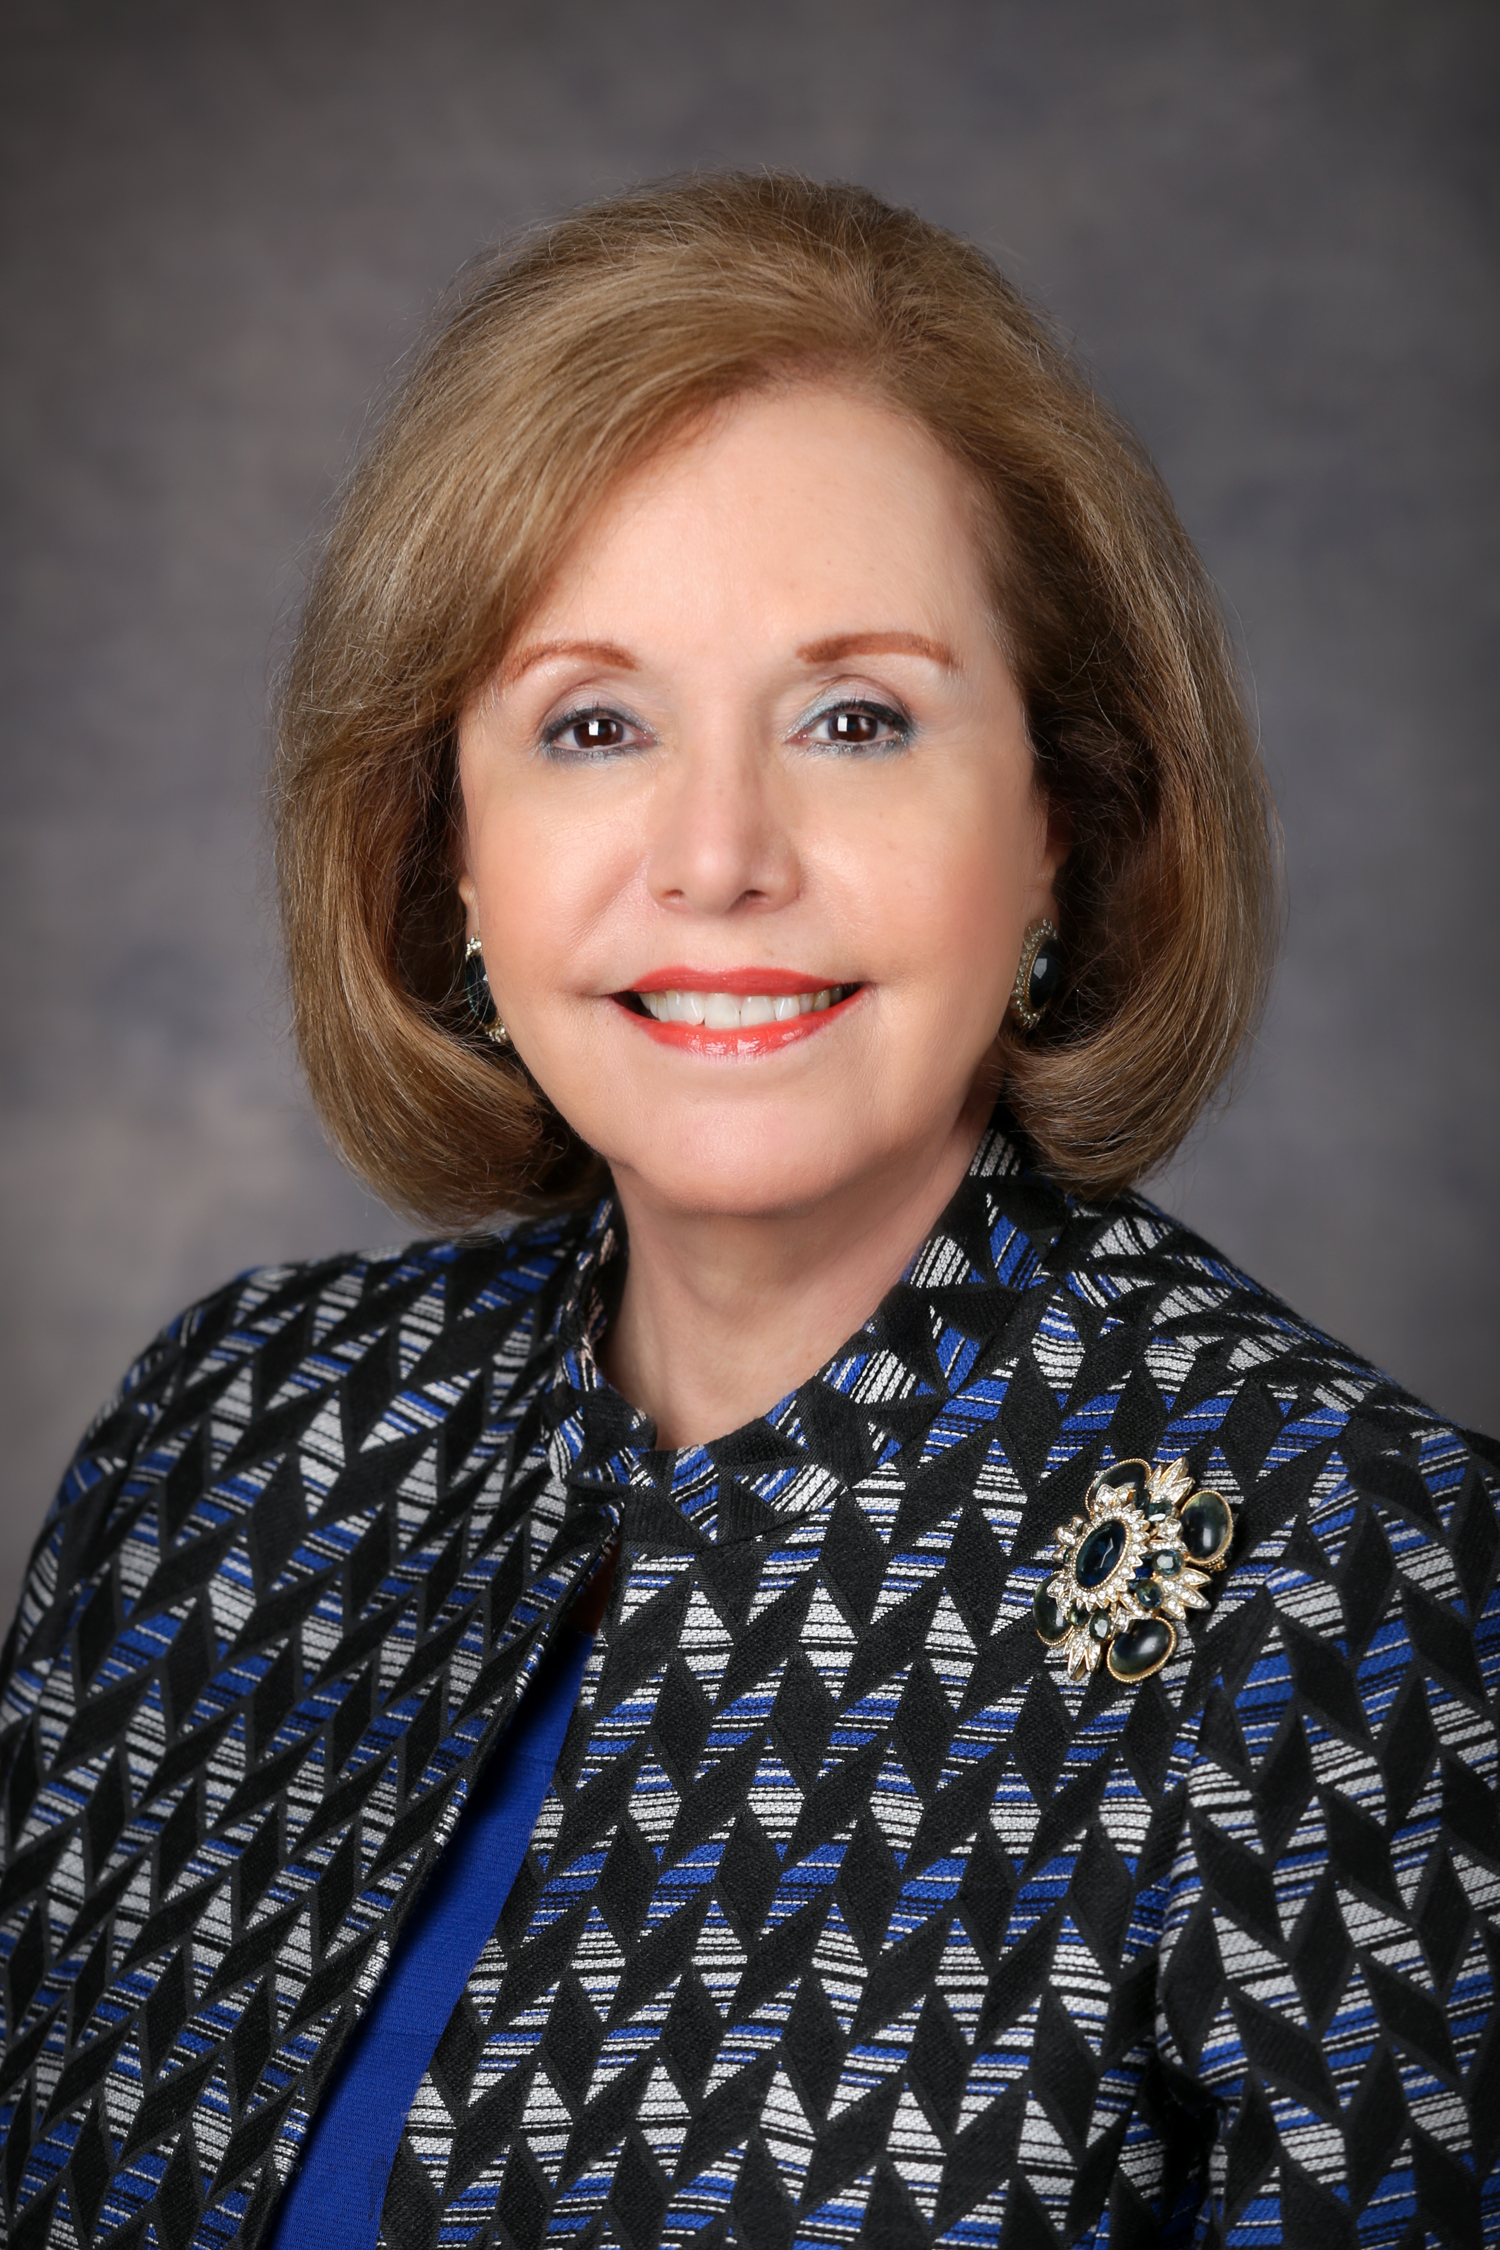 Aida Levitan    Chairperson, U.S. Century Bank Board of Directors; President of The Levitan Group; President of ArtesMiami